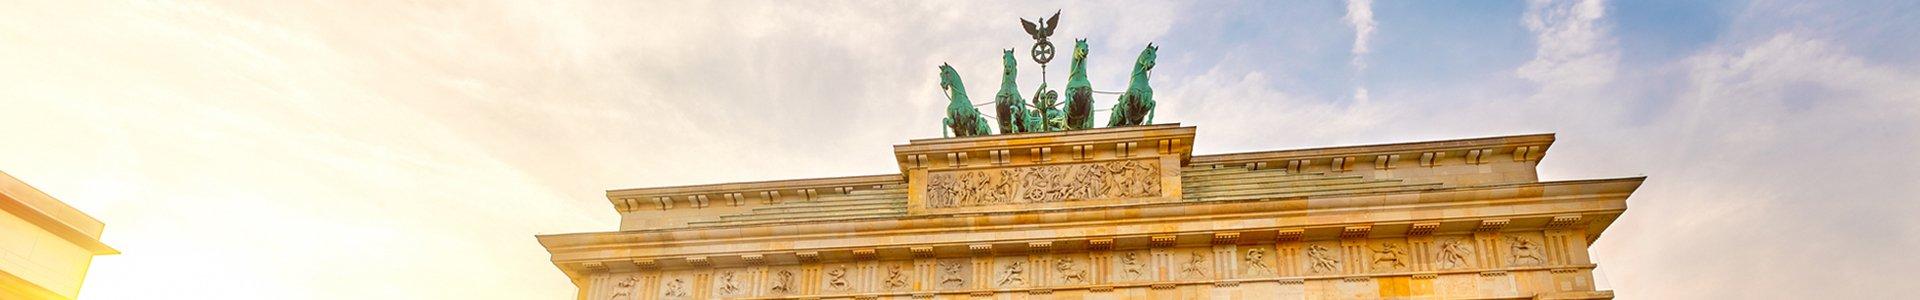 Brandenburger Tor, Berlijn, Duitsland